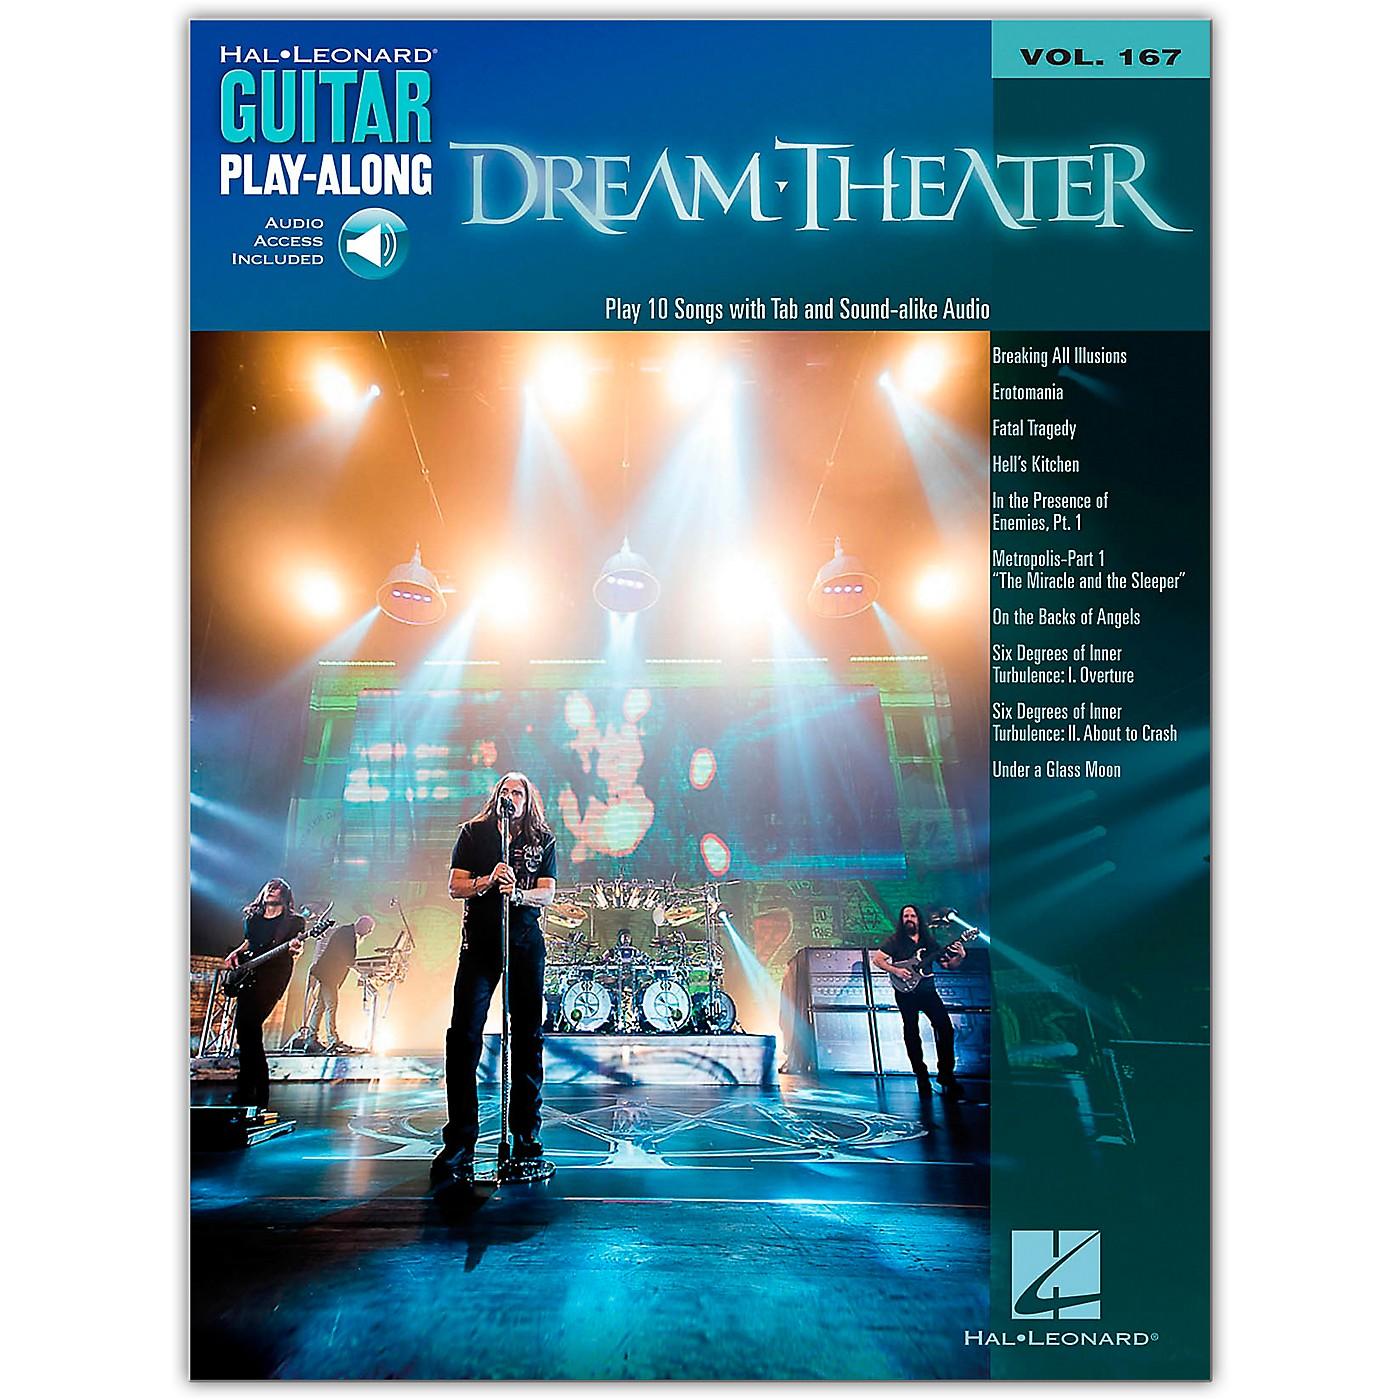 Hal Leonard Dream Theater - Guitar Play-Along Vol. 167 Book/Online Audio thumbnail